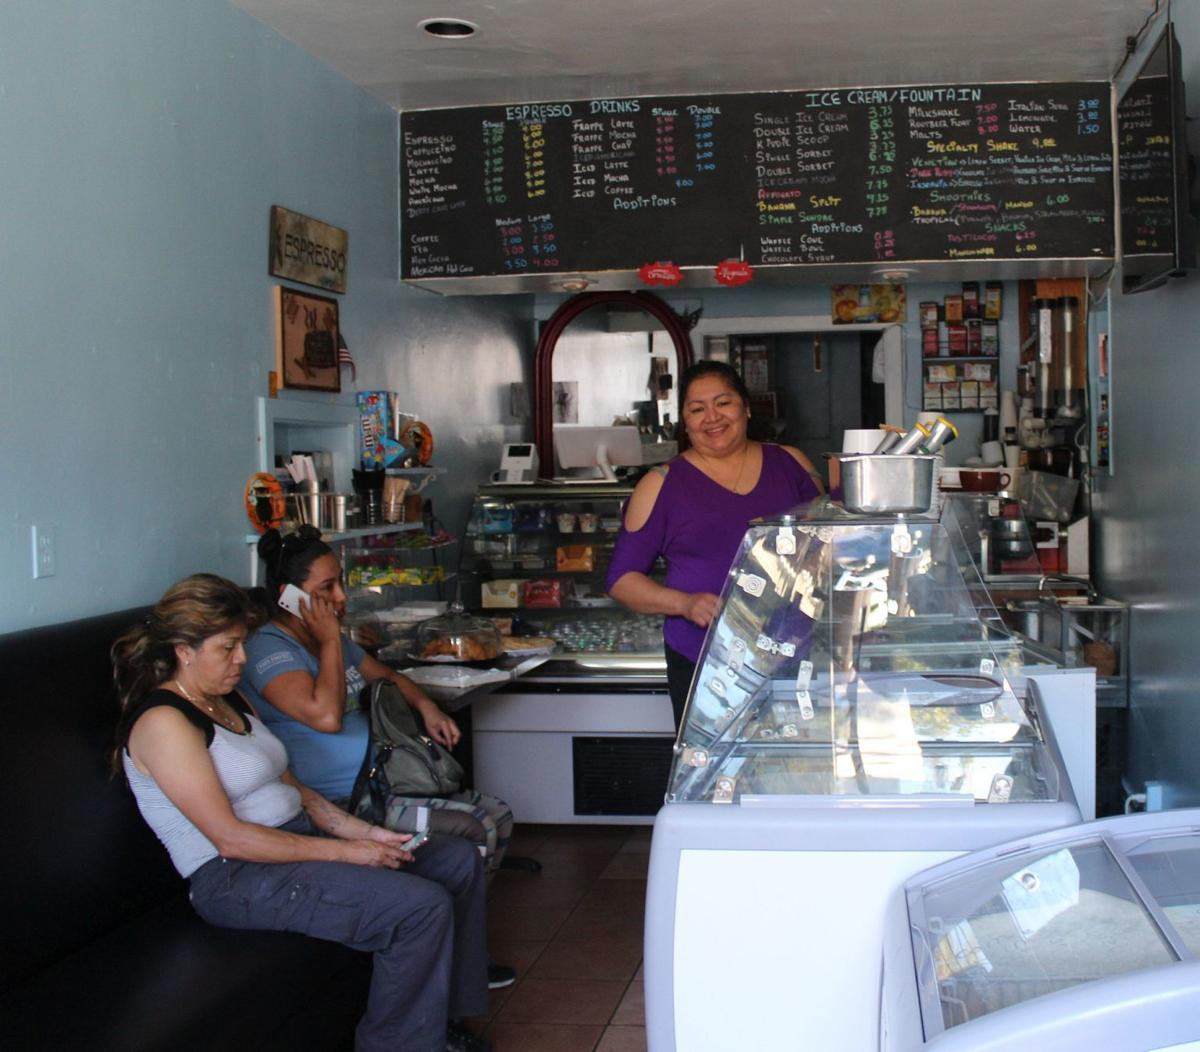 Cafe San Marco